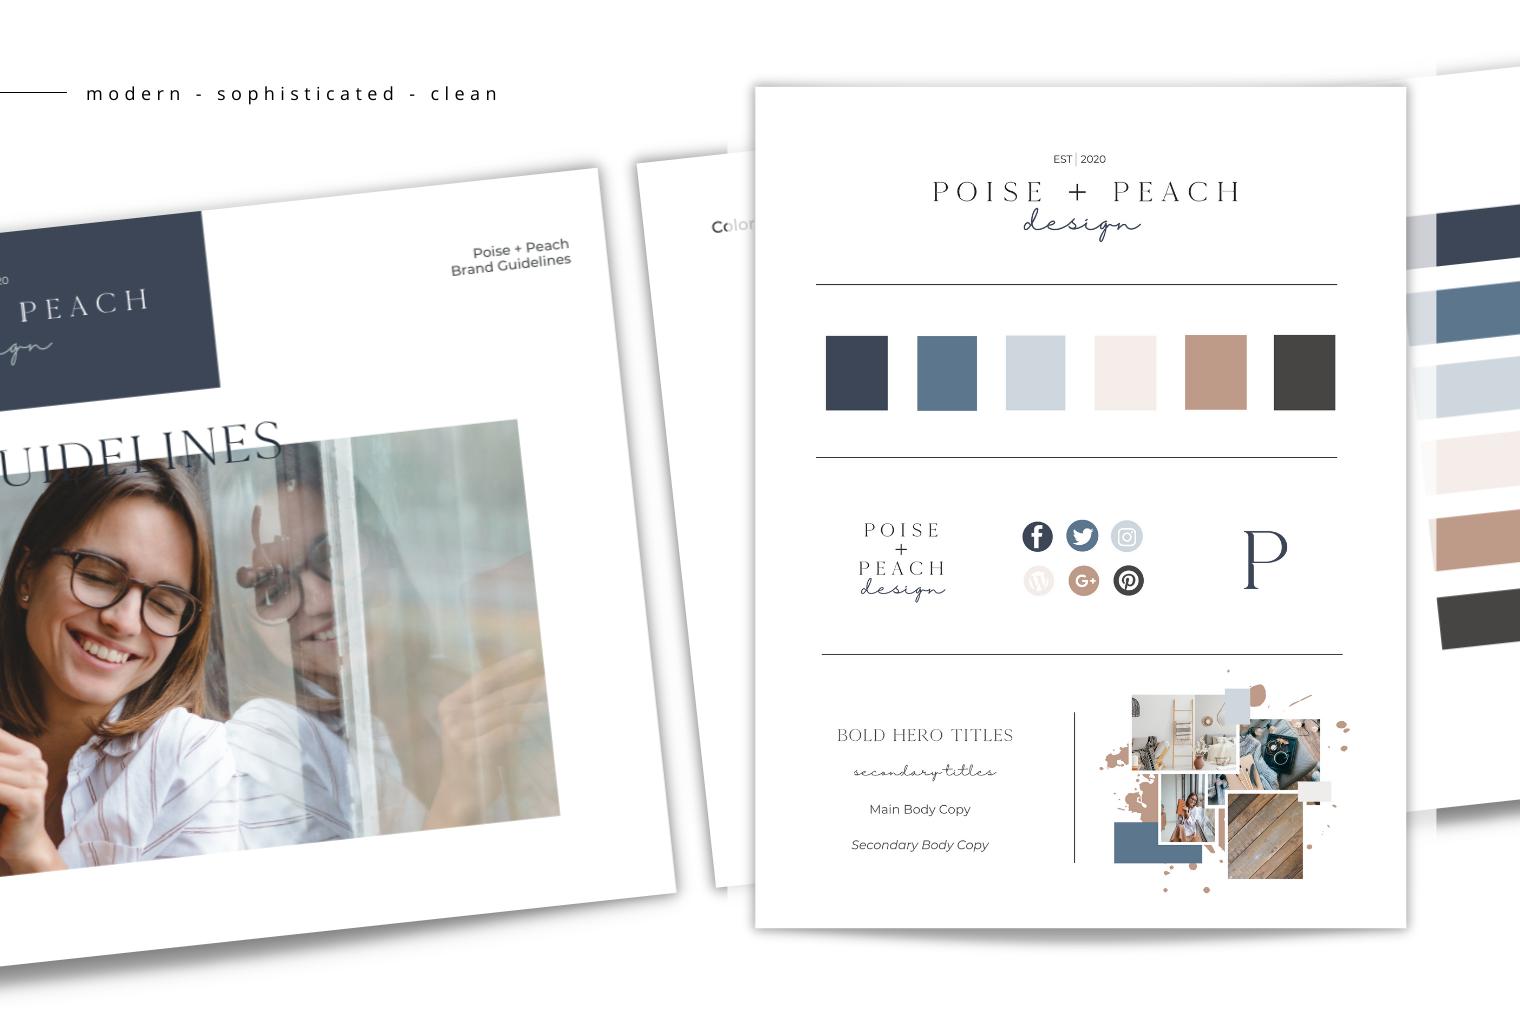 Poise + Peach Semi-Custom Brand Design